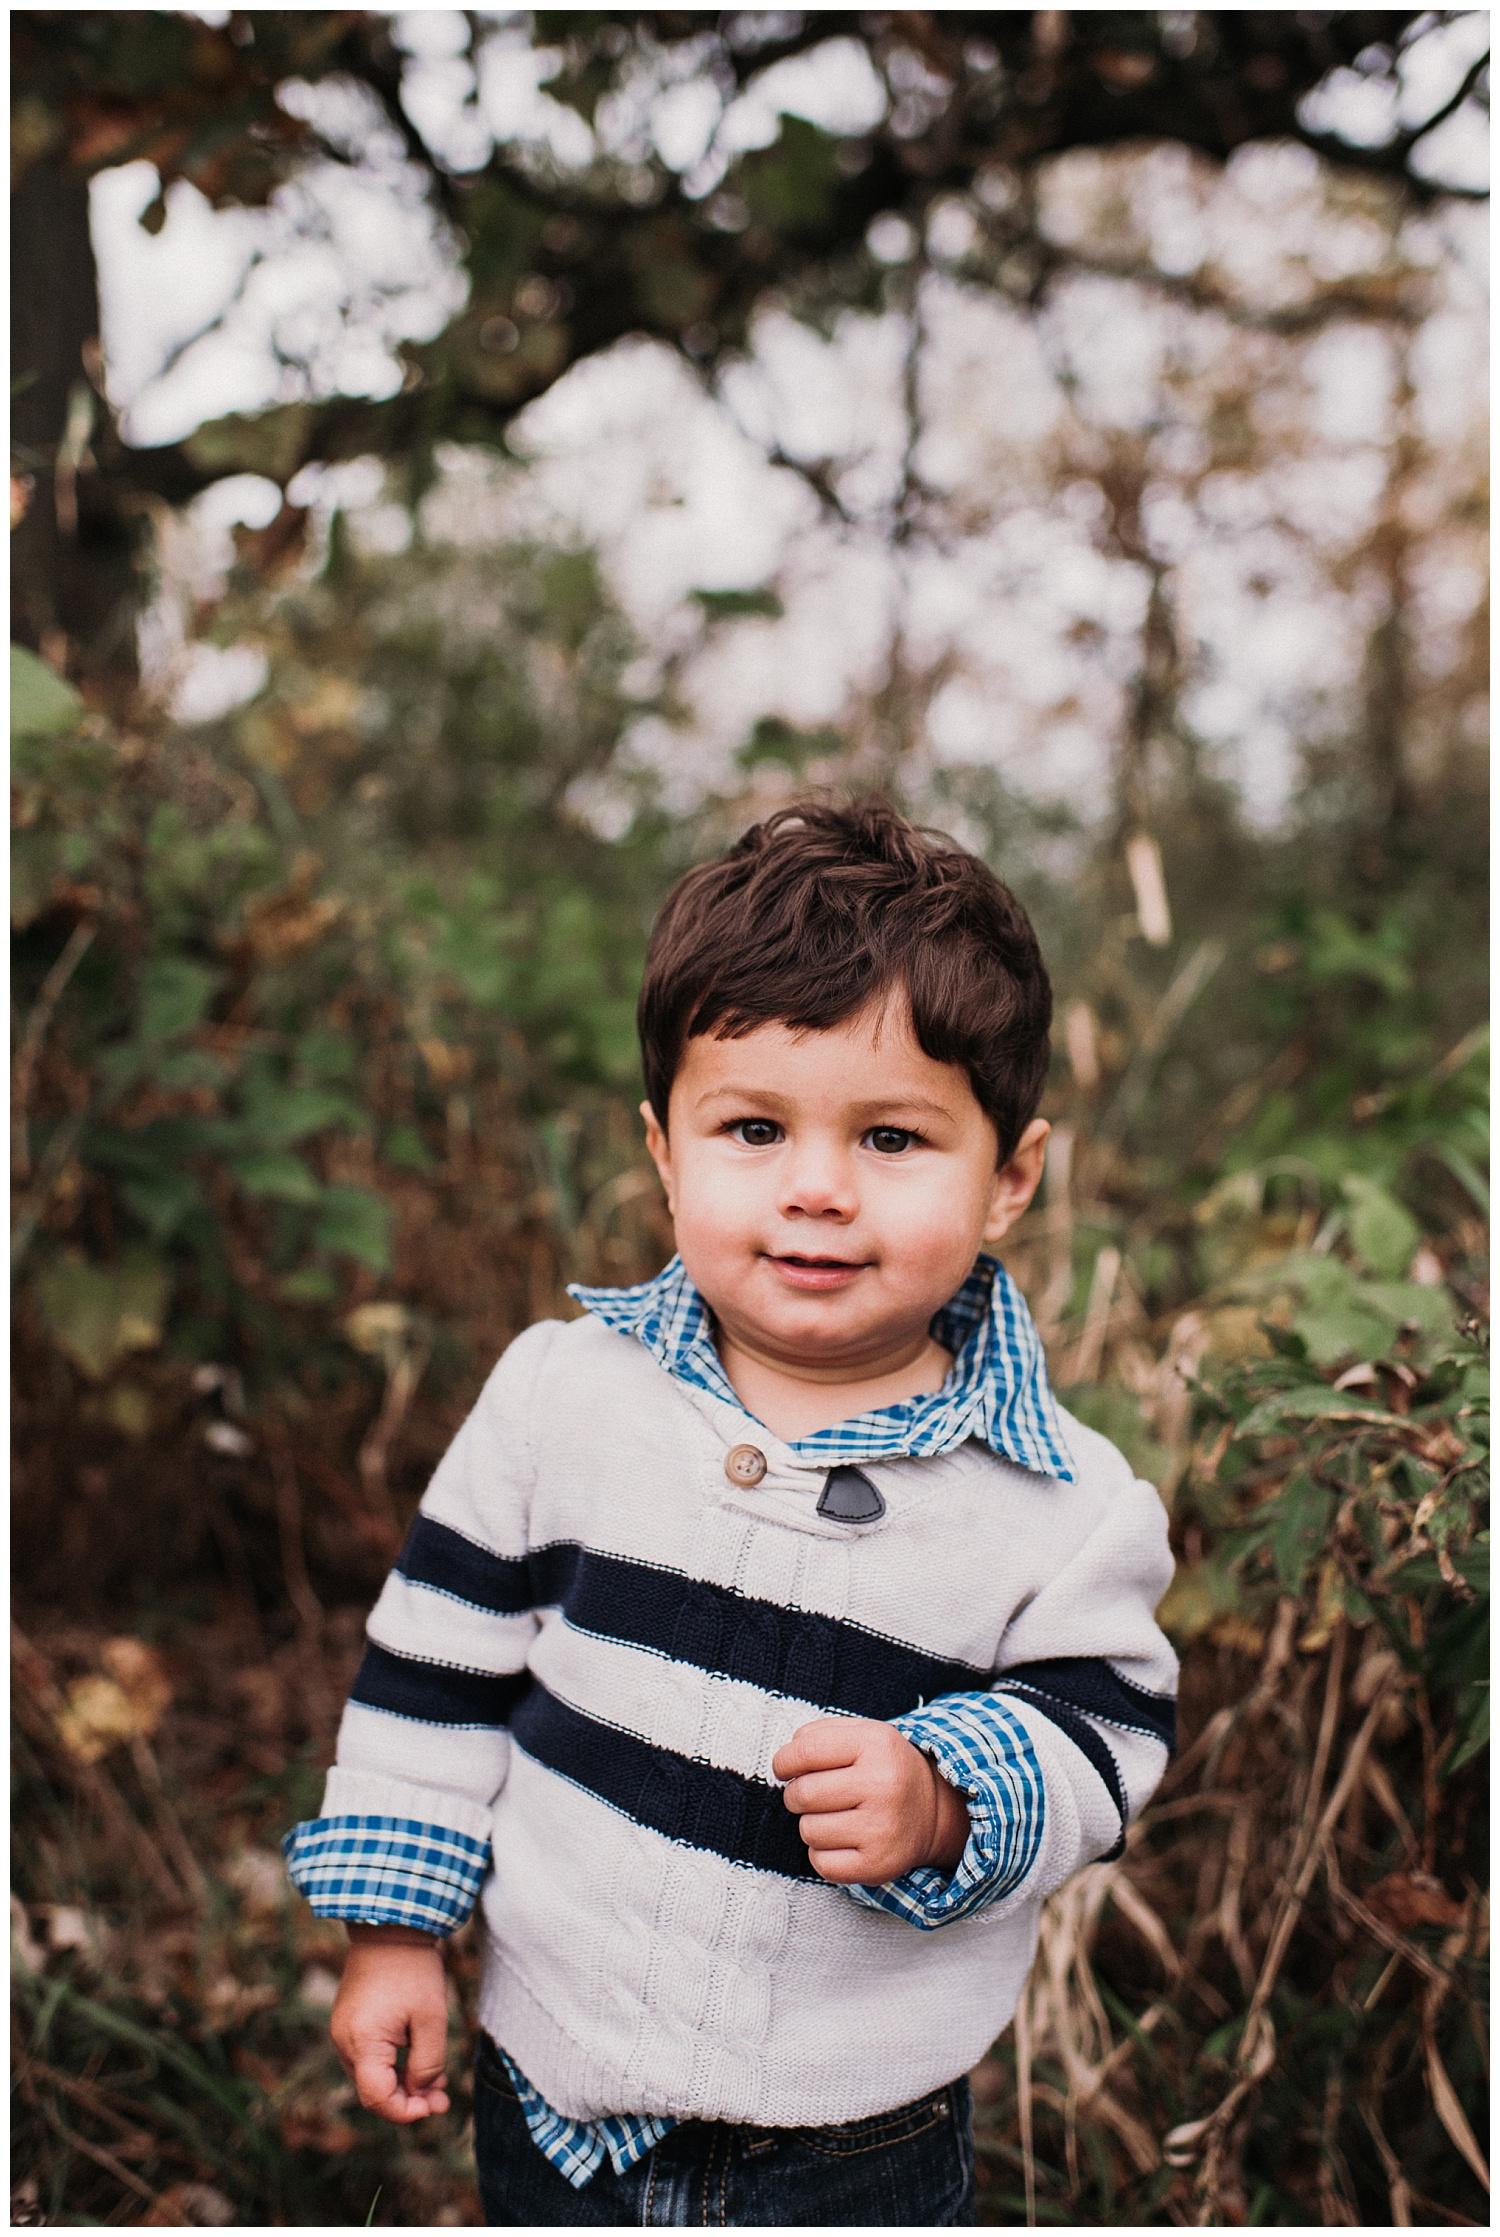 Sussex-Family-Photographer-2019 (7).jpg